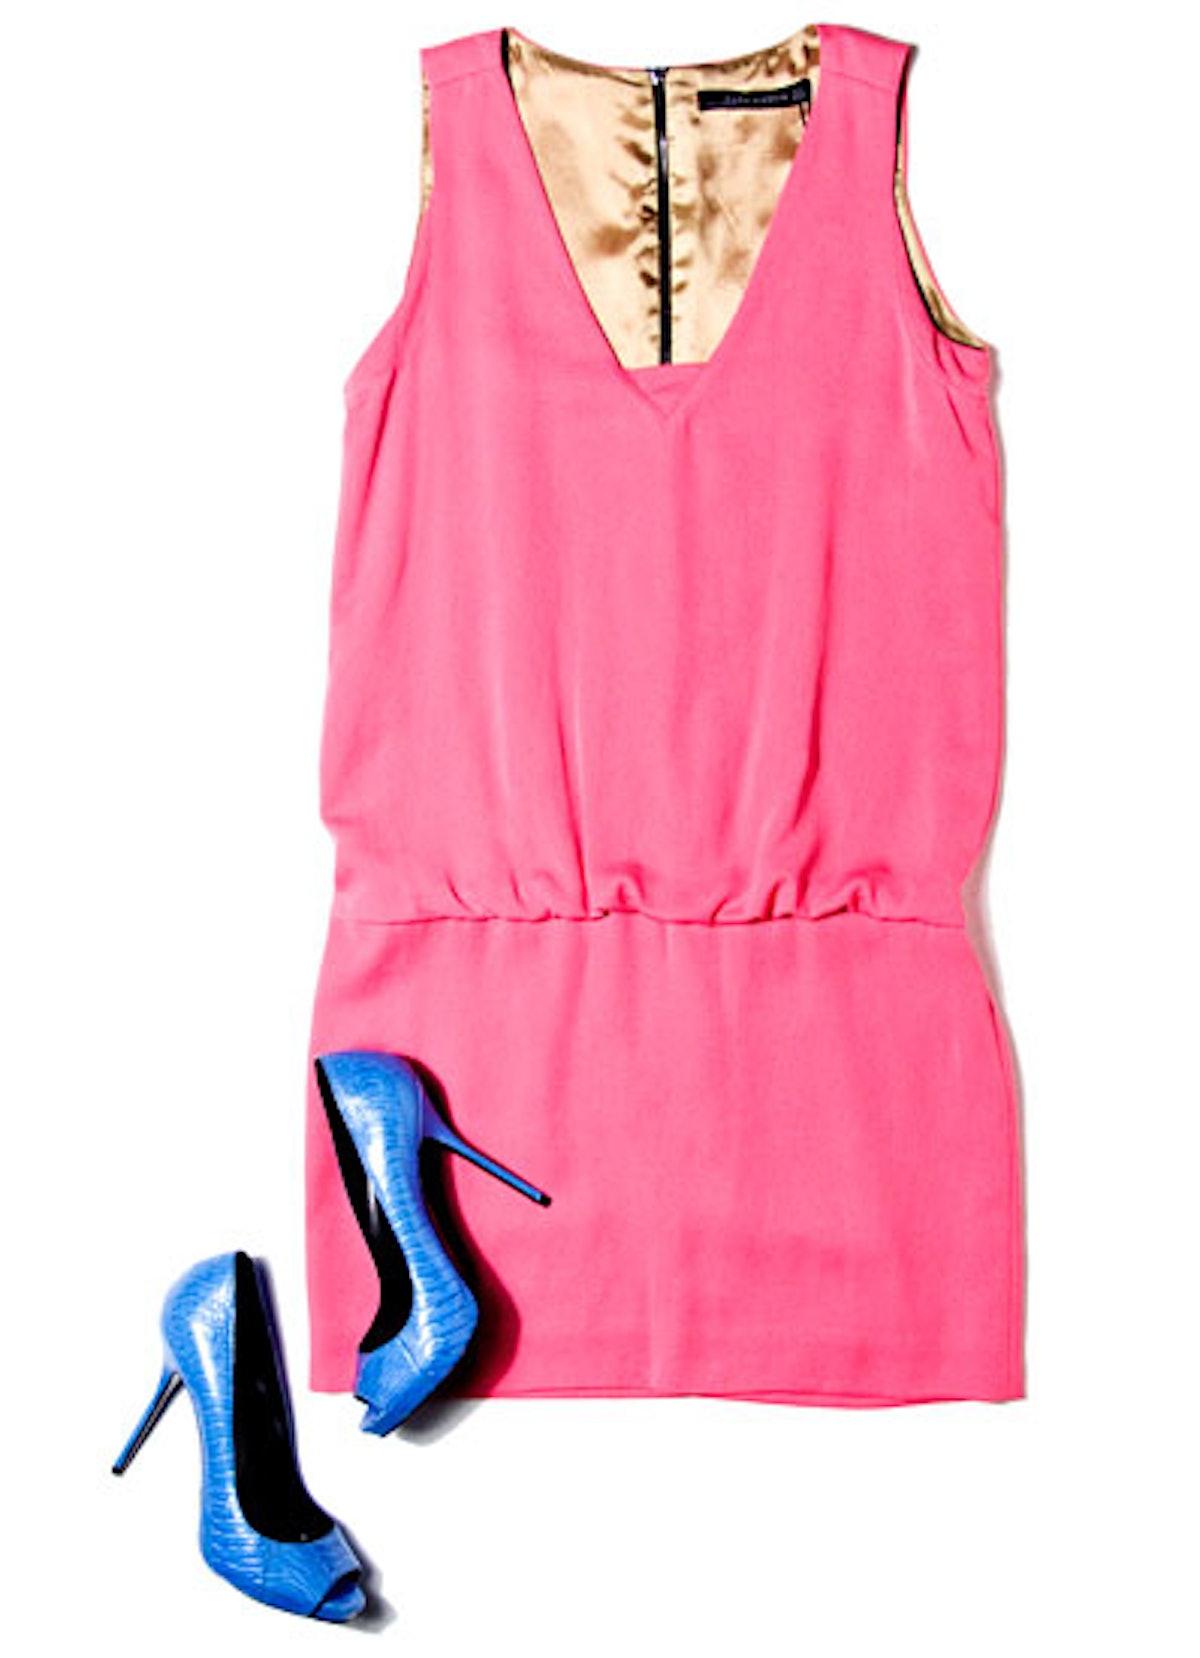 fass-spring-fashion-trends-04-v.jpg